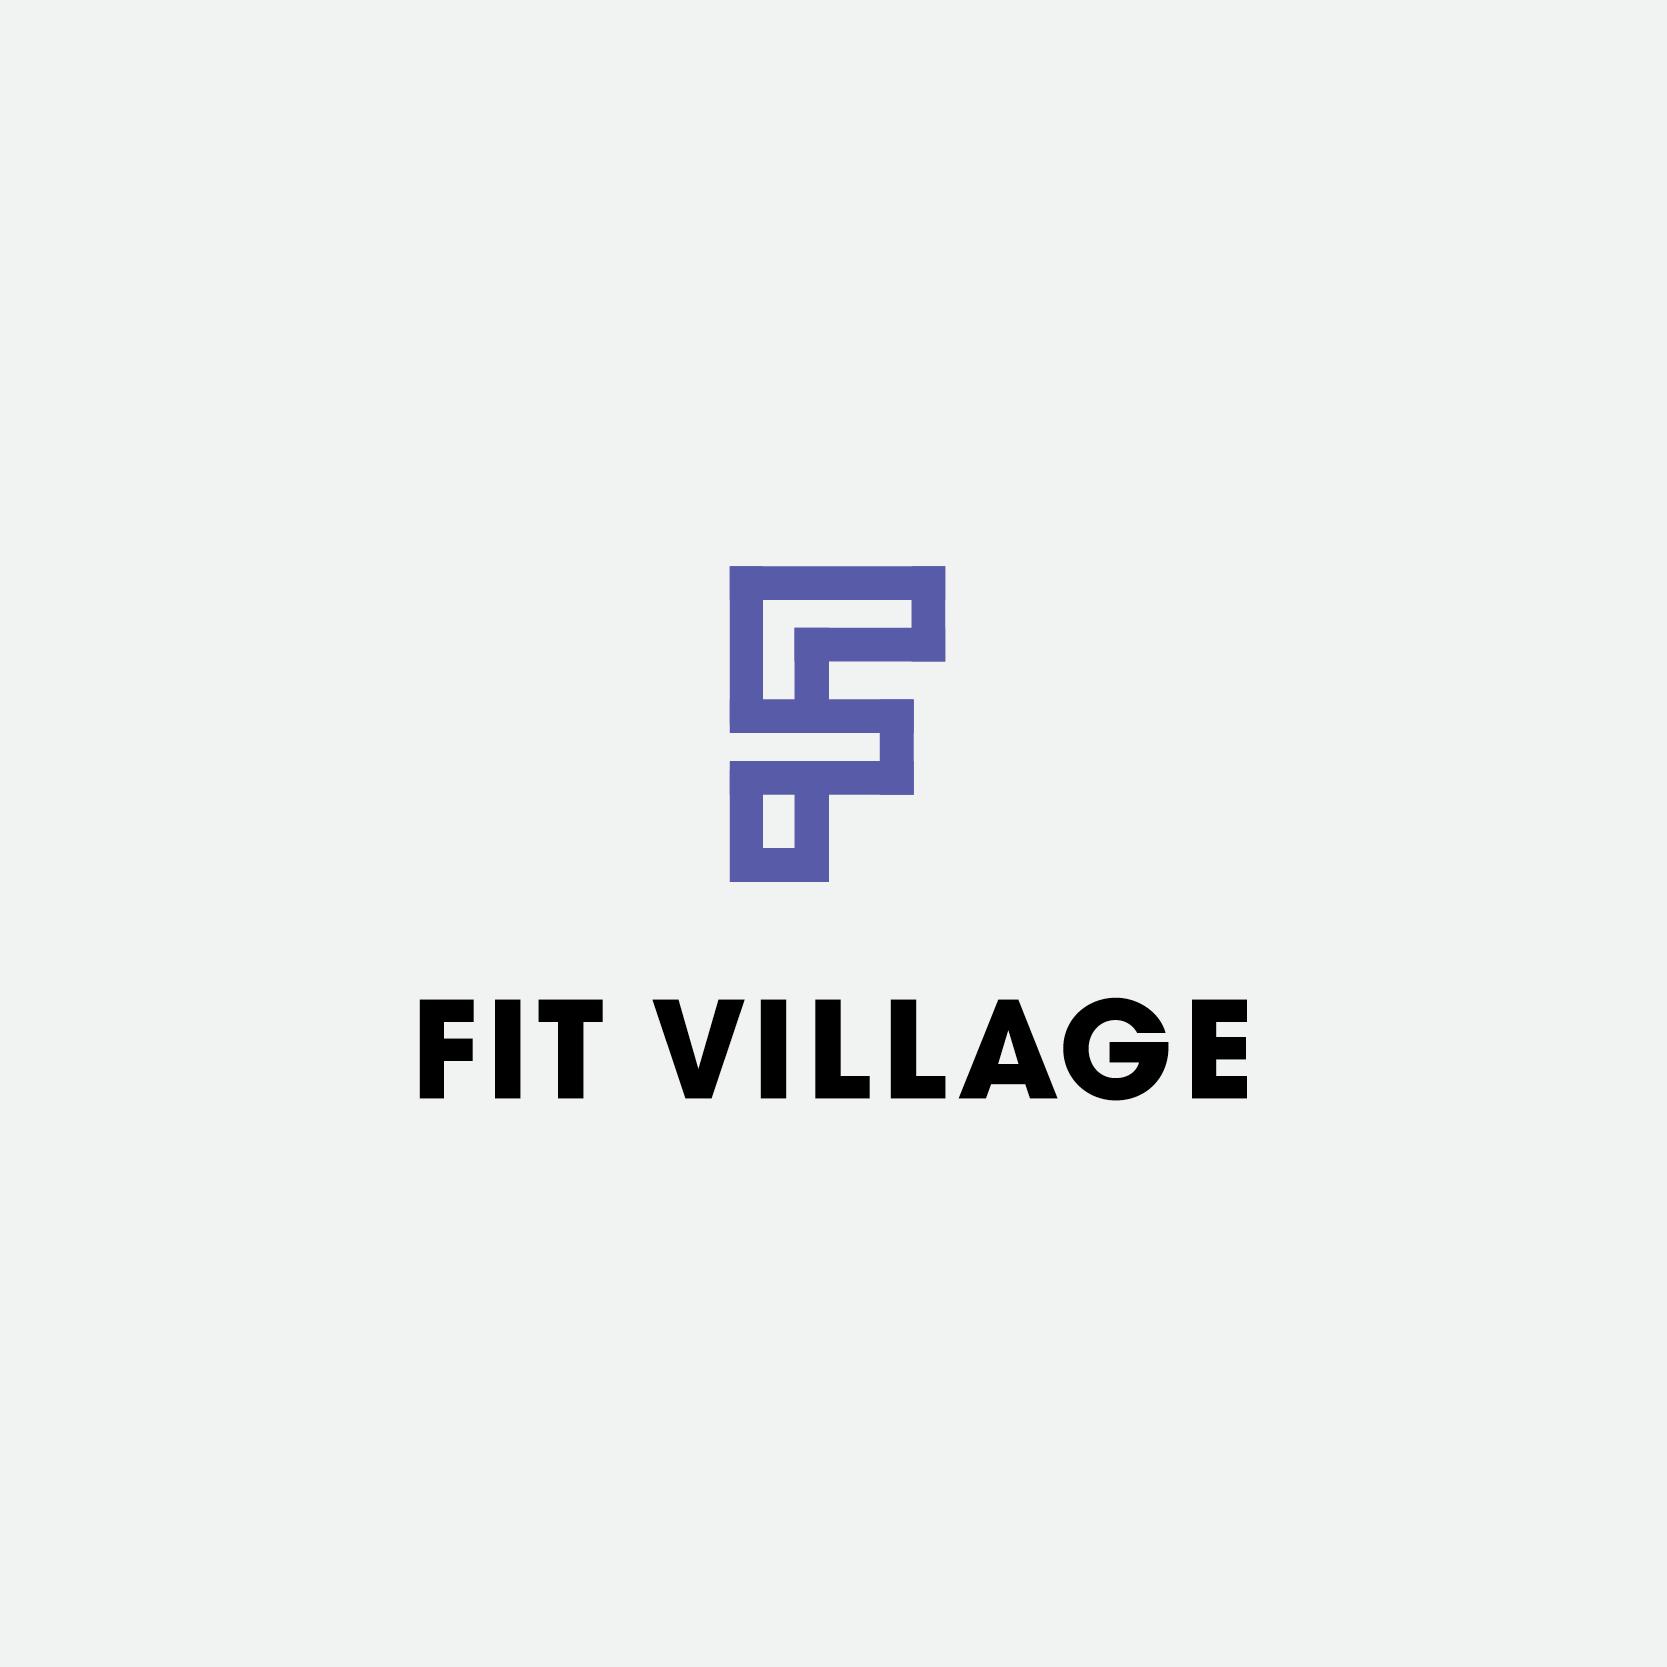 Fit Village Logo